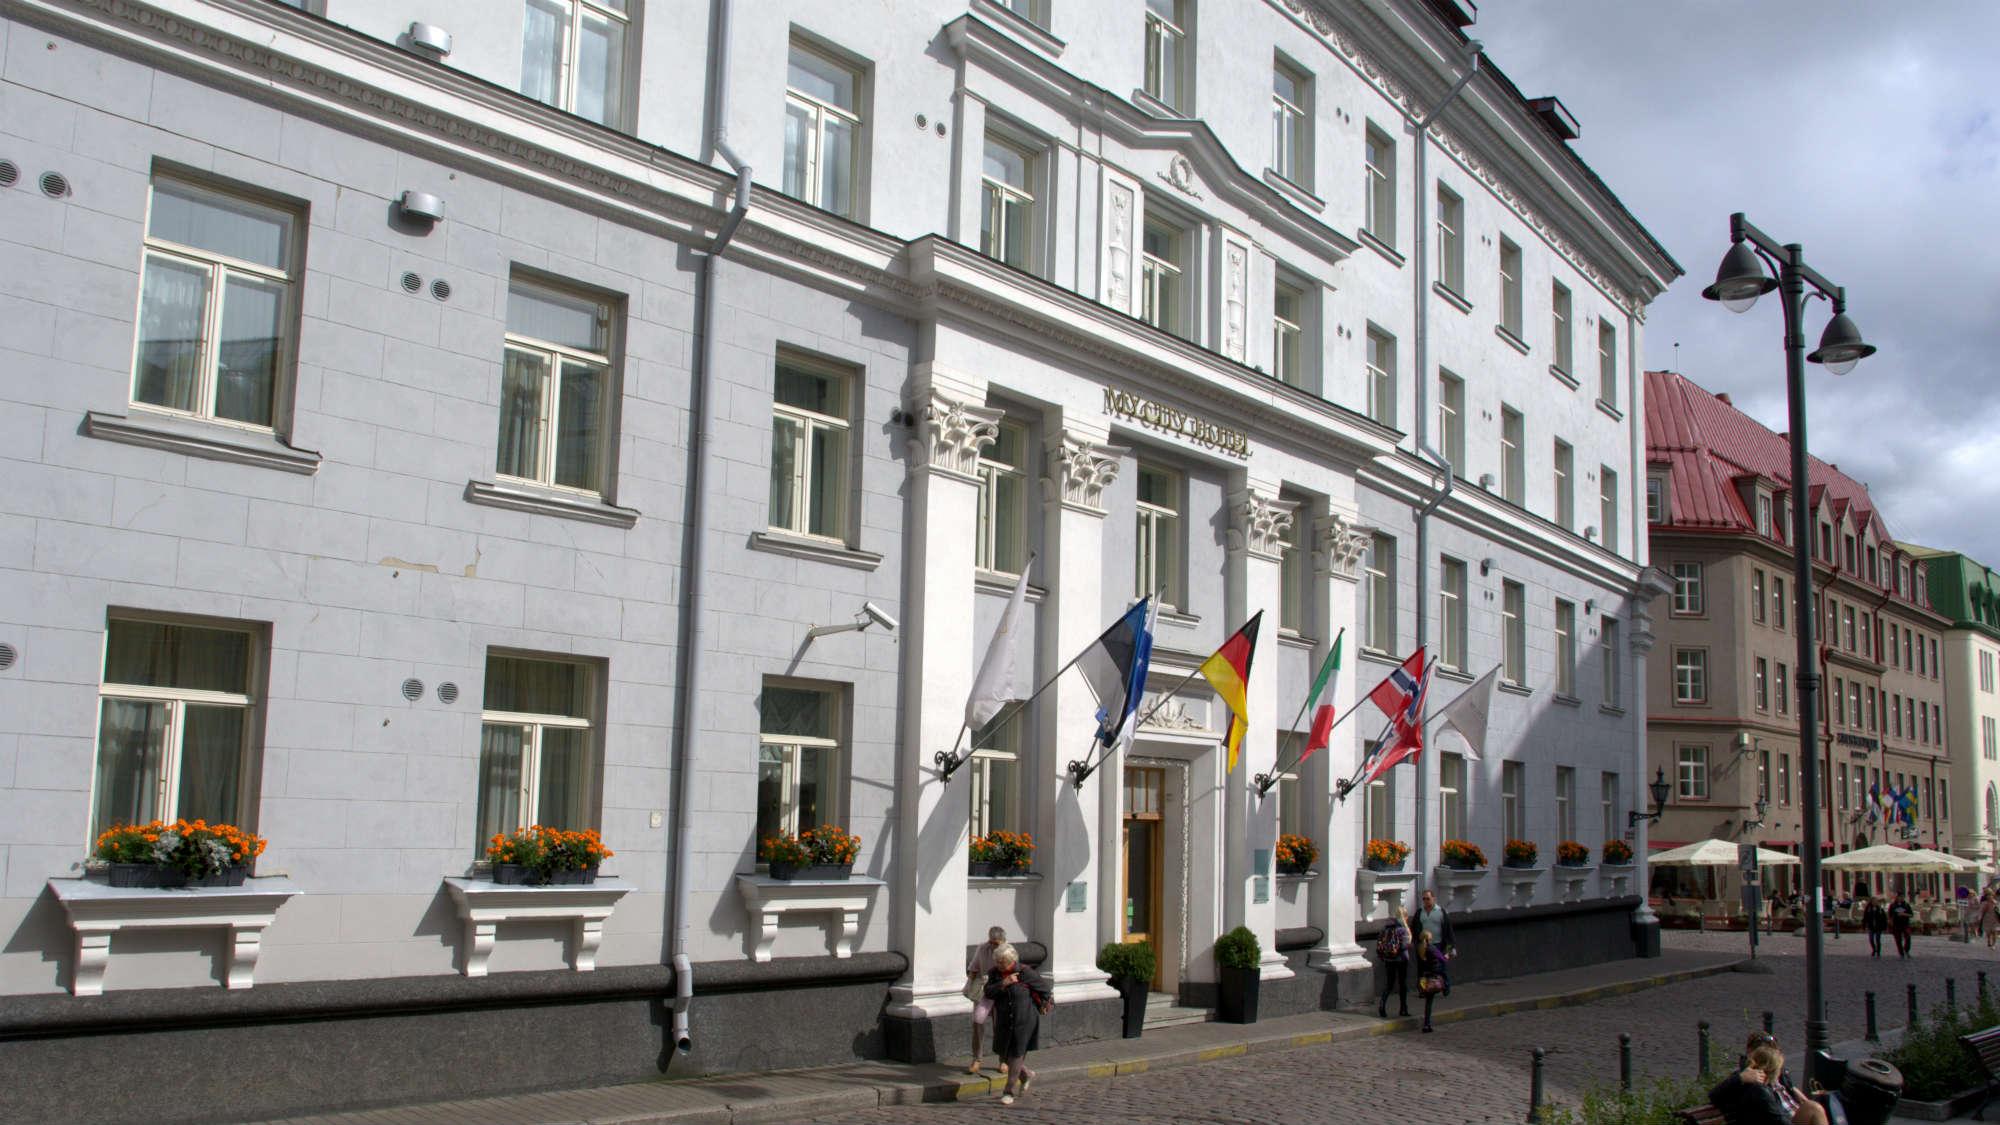 2000X1125_Hotel_MyCity_in Tallinn_facade